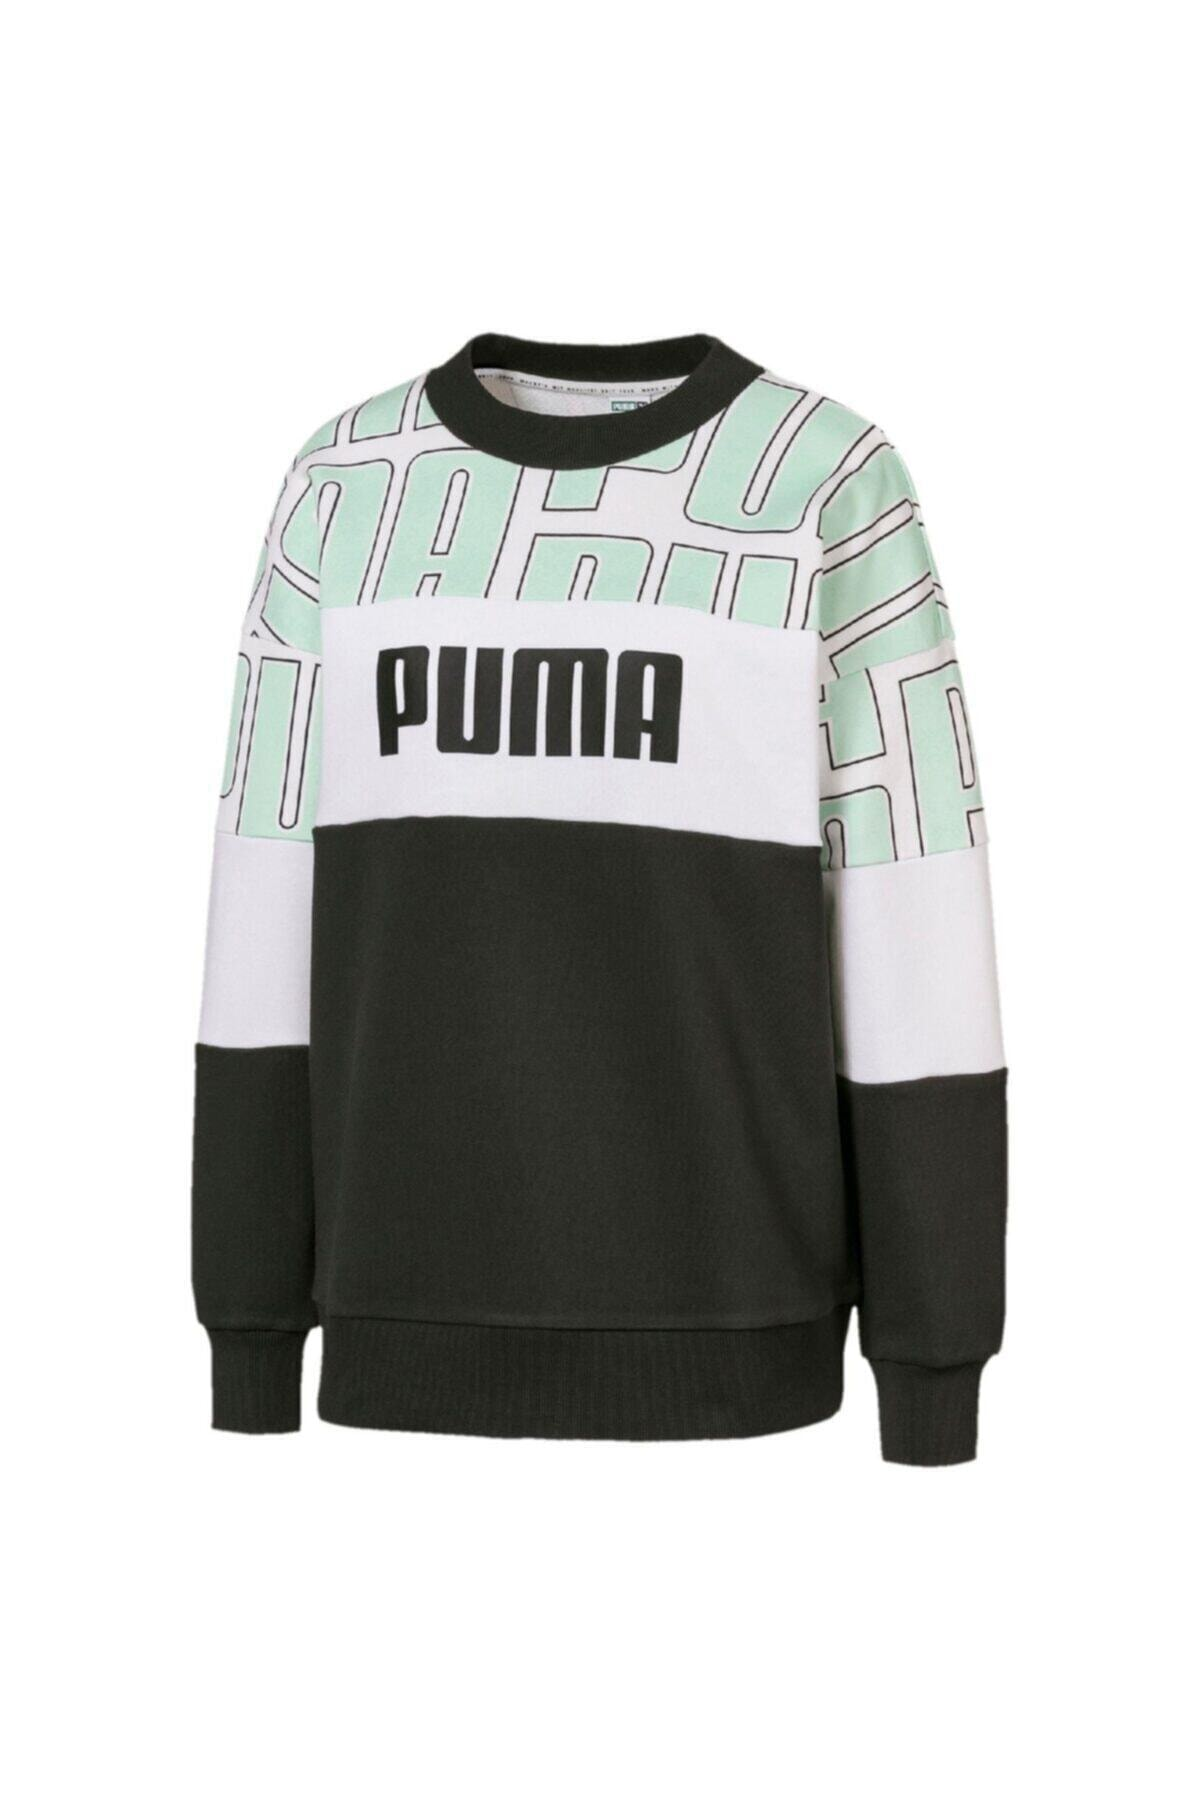 Puma Aop Crew Kadın Sweatshirt - 59625032 1